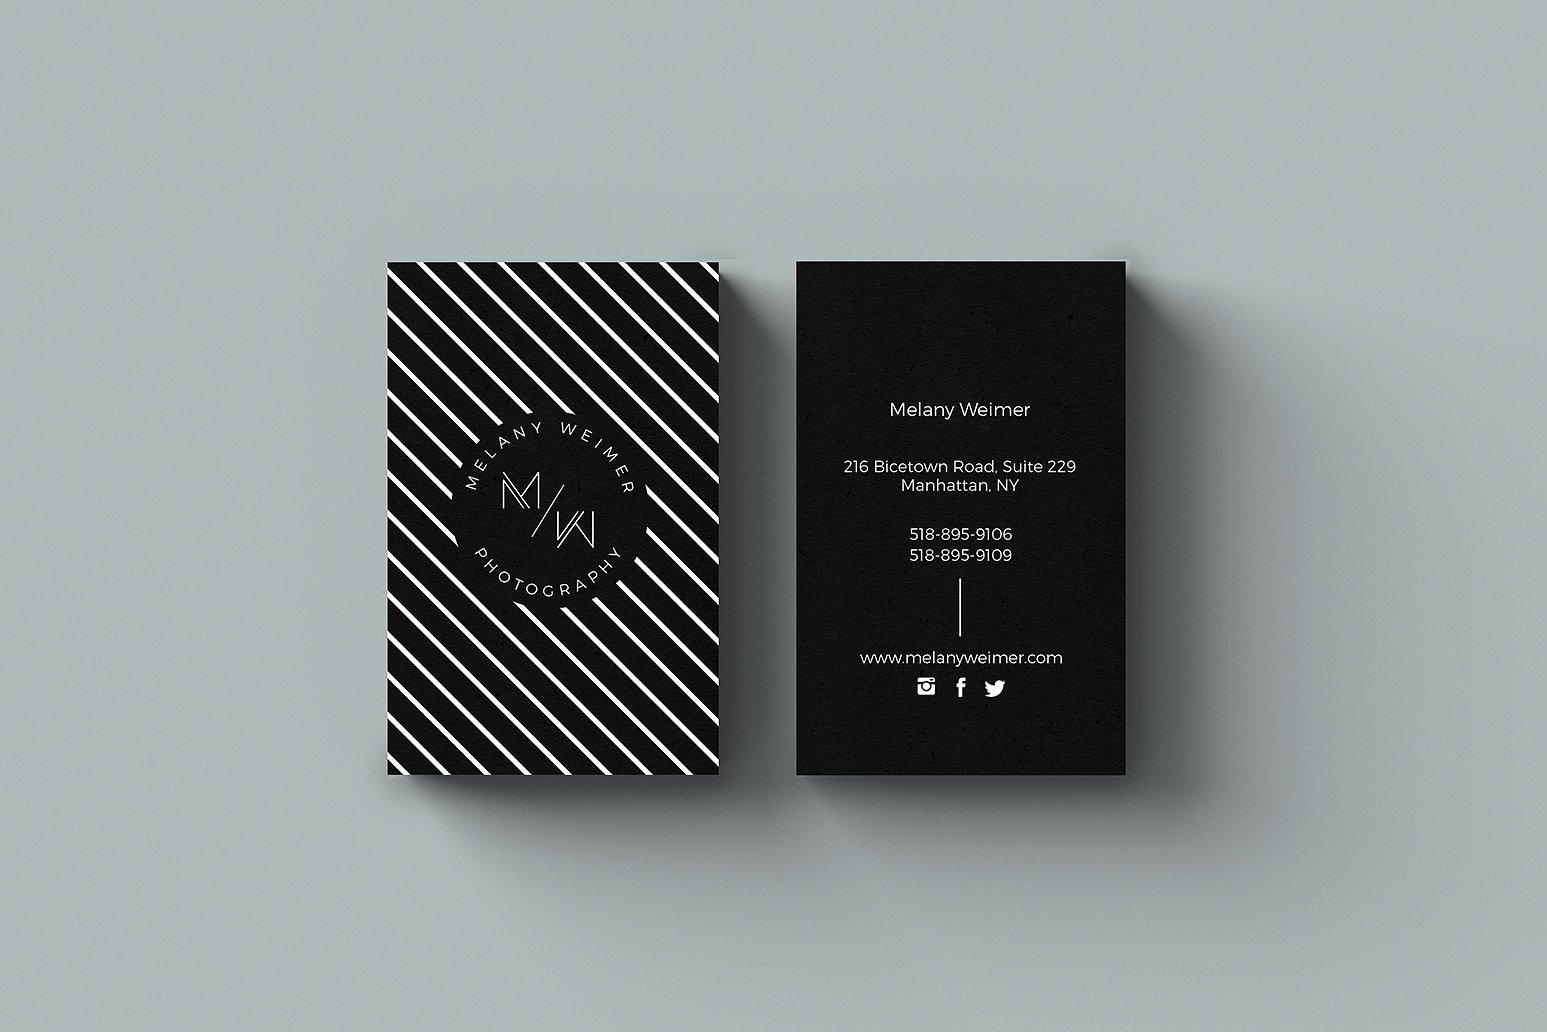 40+ Business Card Templates for Photographers | Decolore.Net